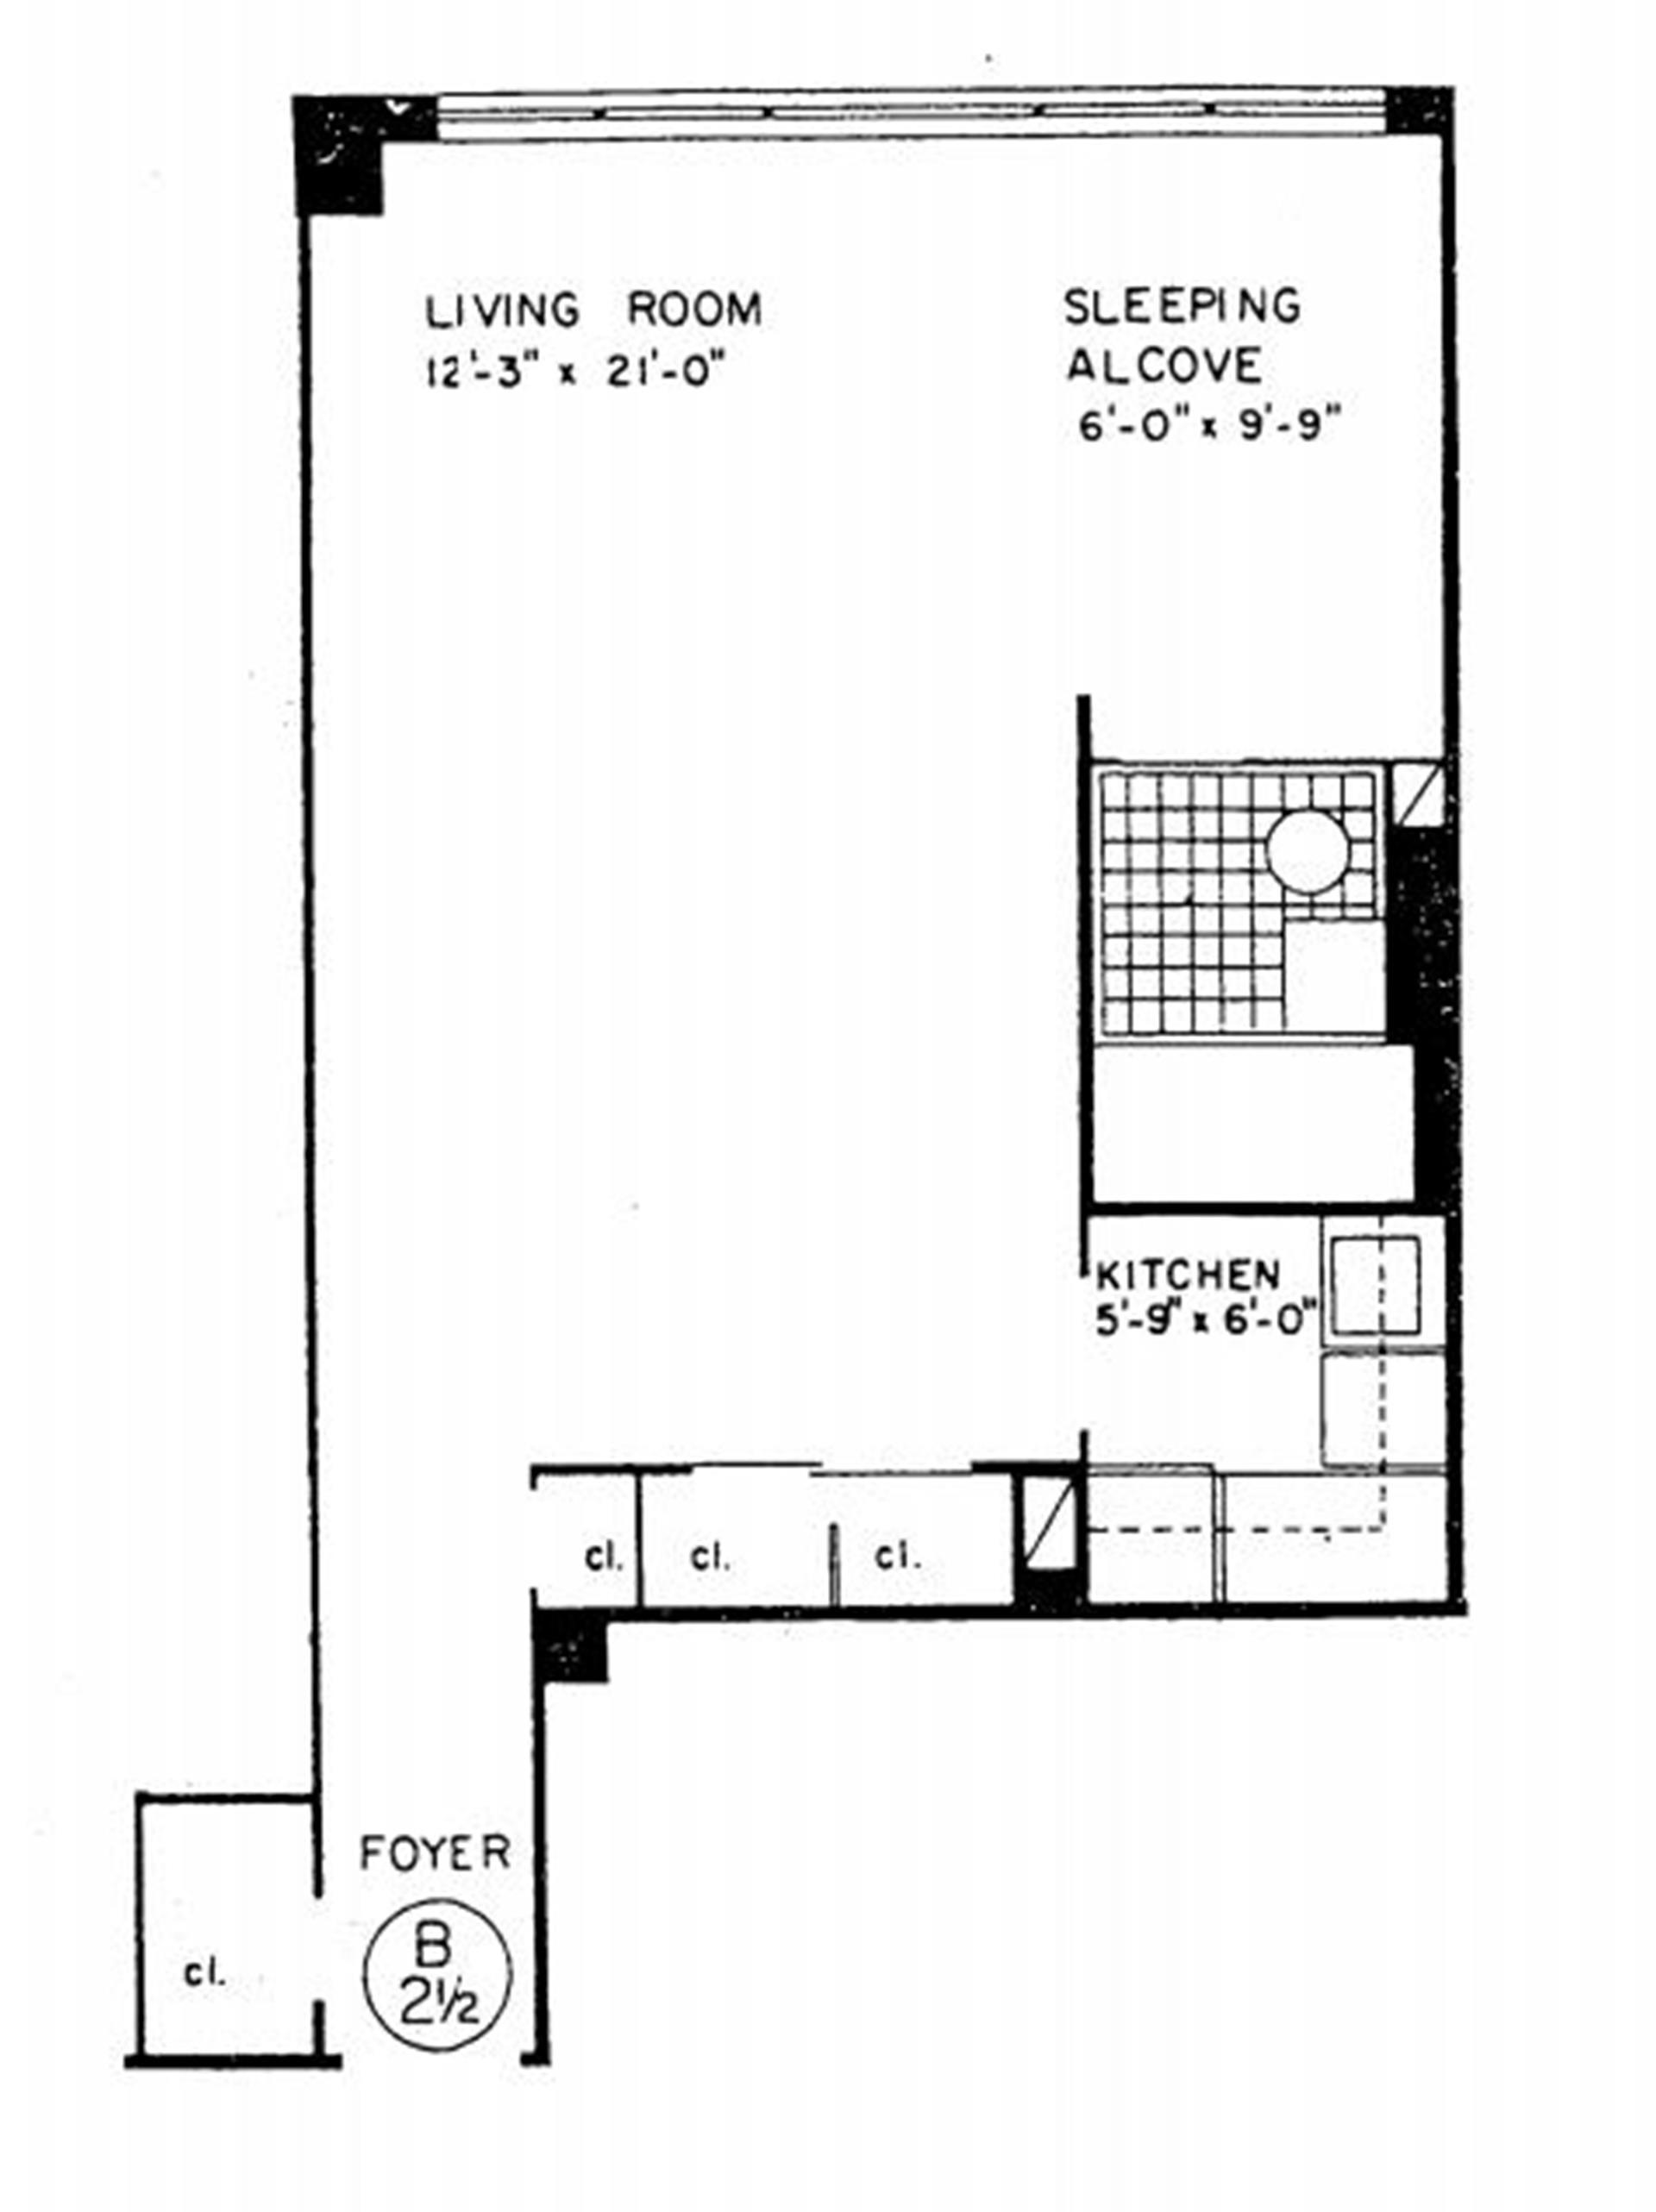 Floor plan of 240 East 55th St, 3B - Turtle Bay, New York